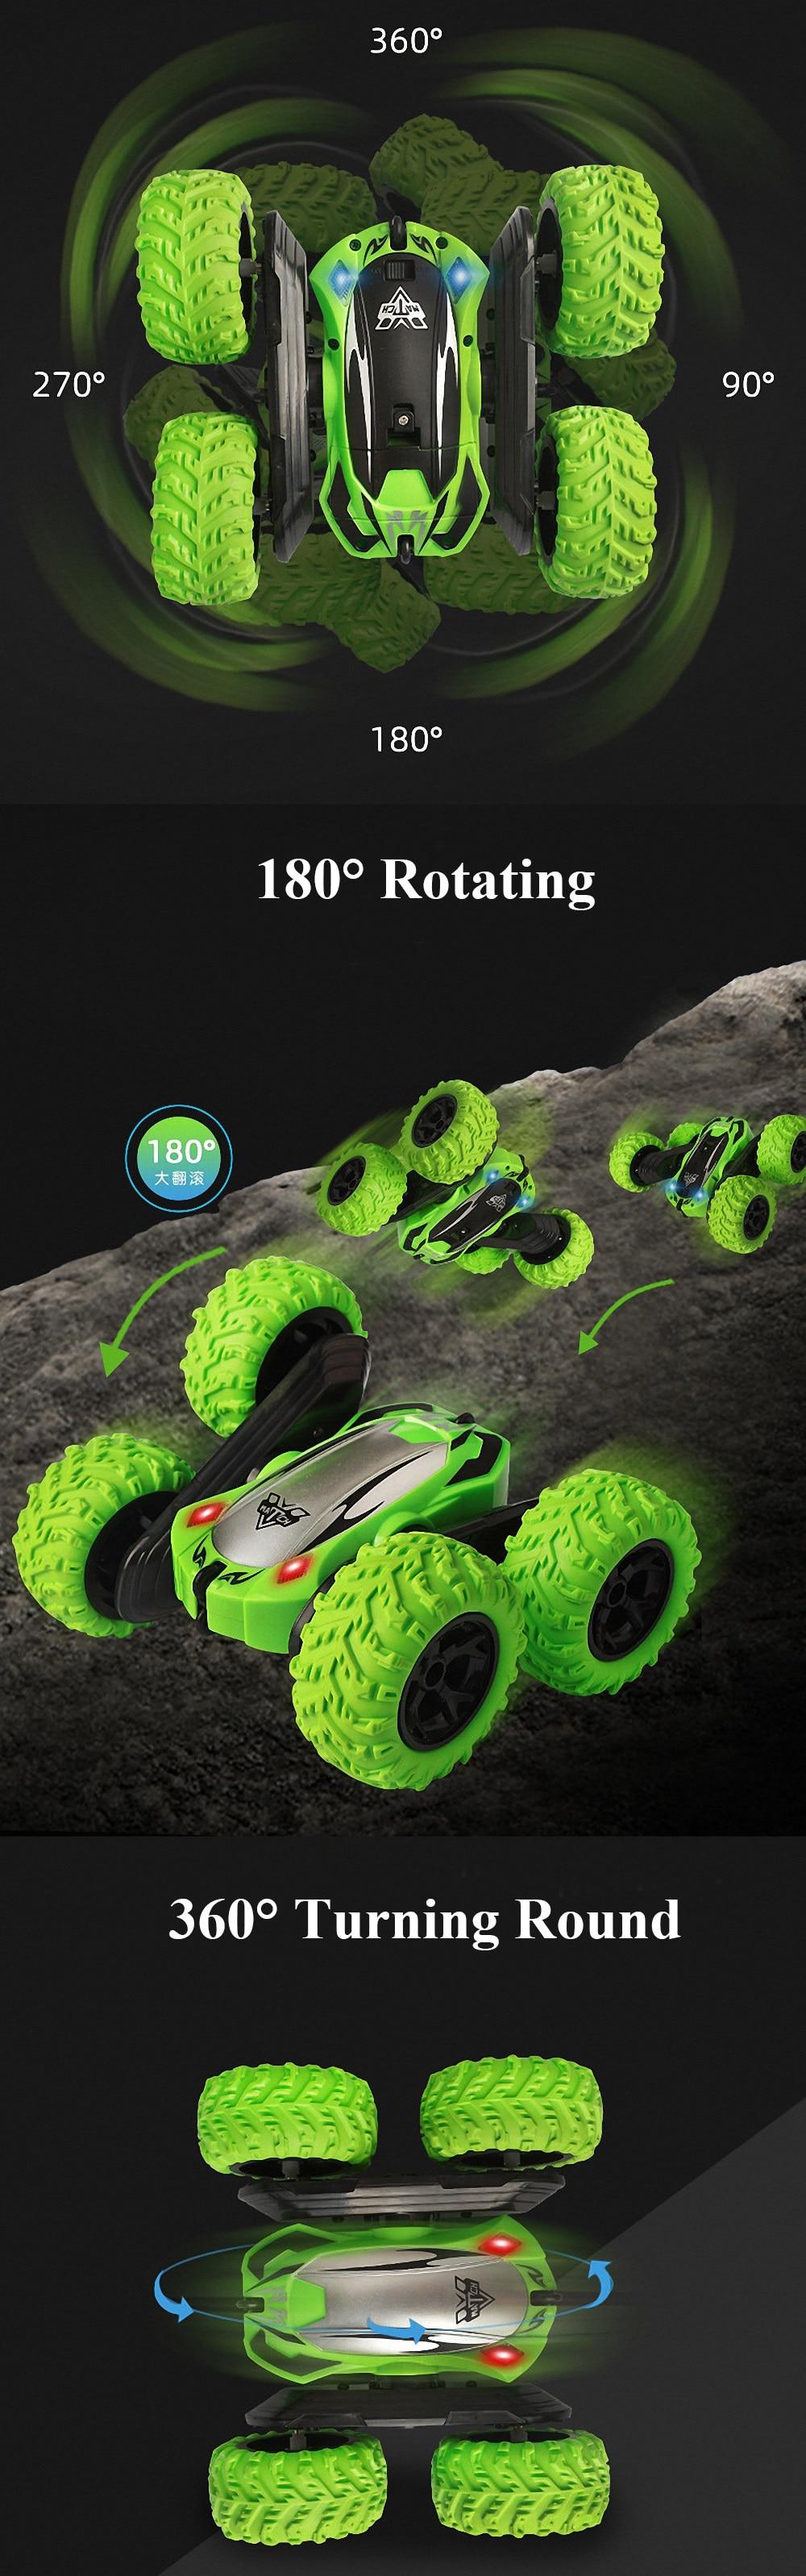 rock crawler brinquedos de controle remoto controle